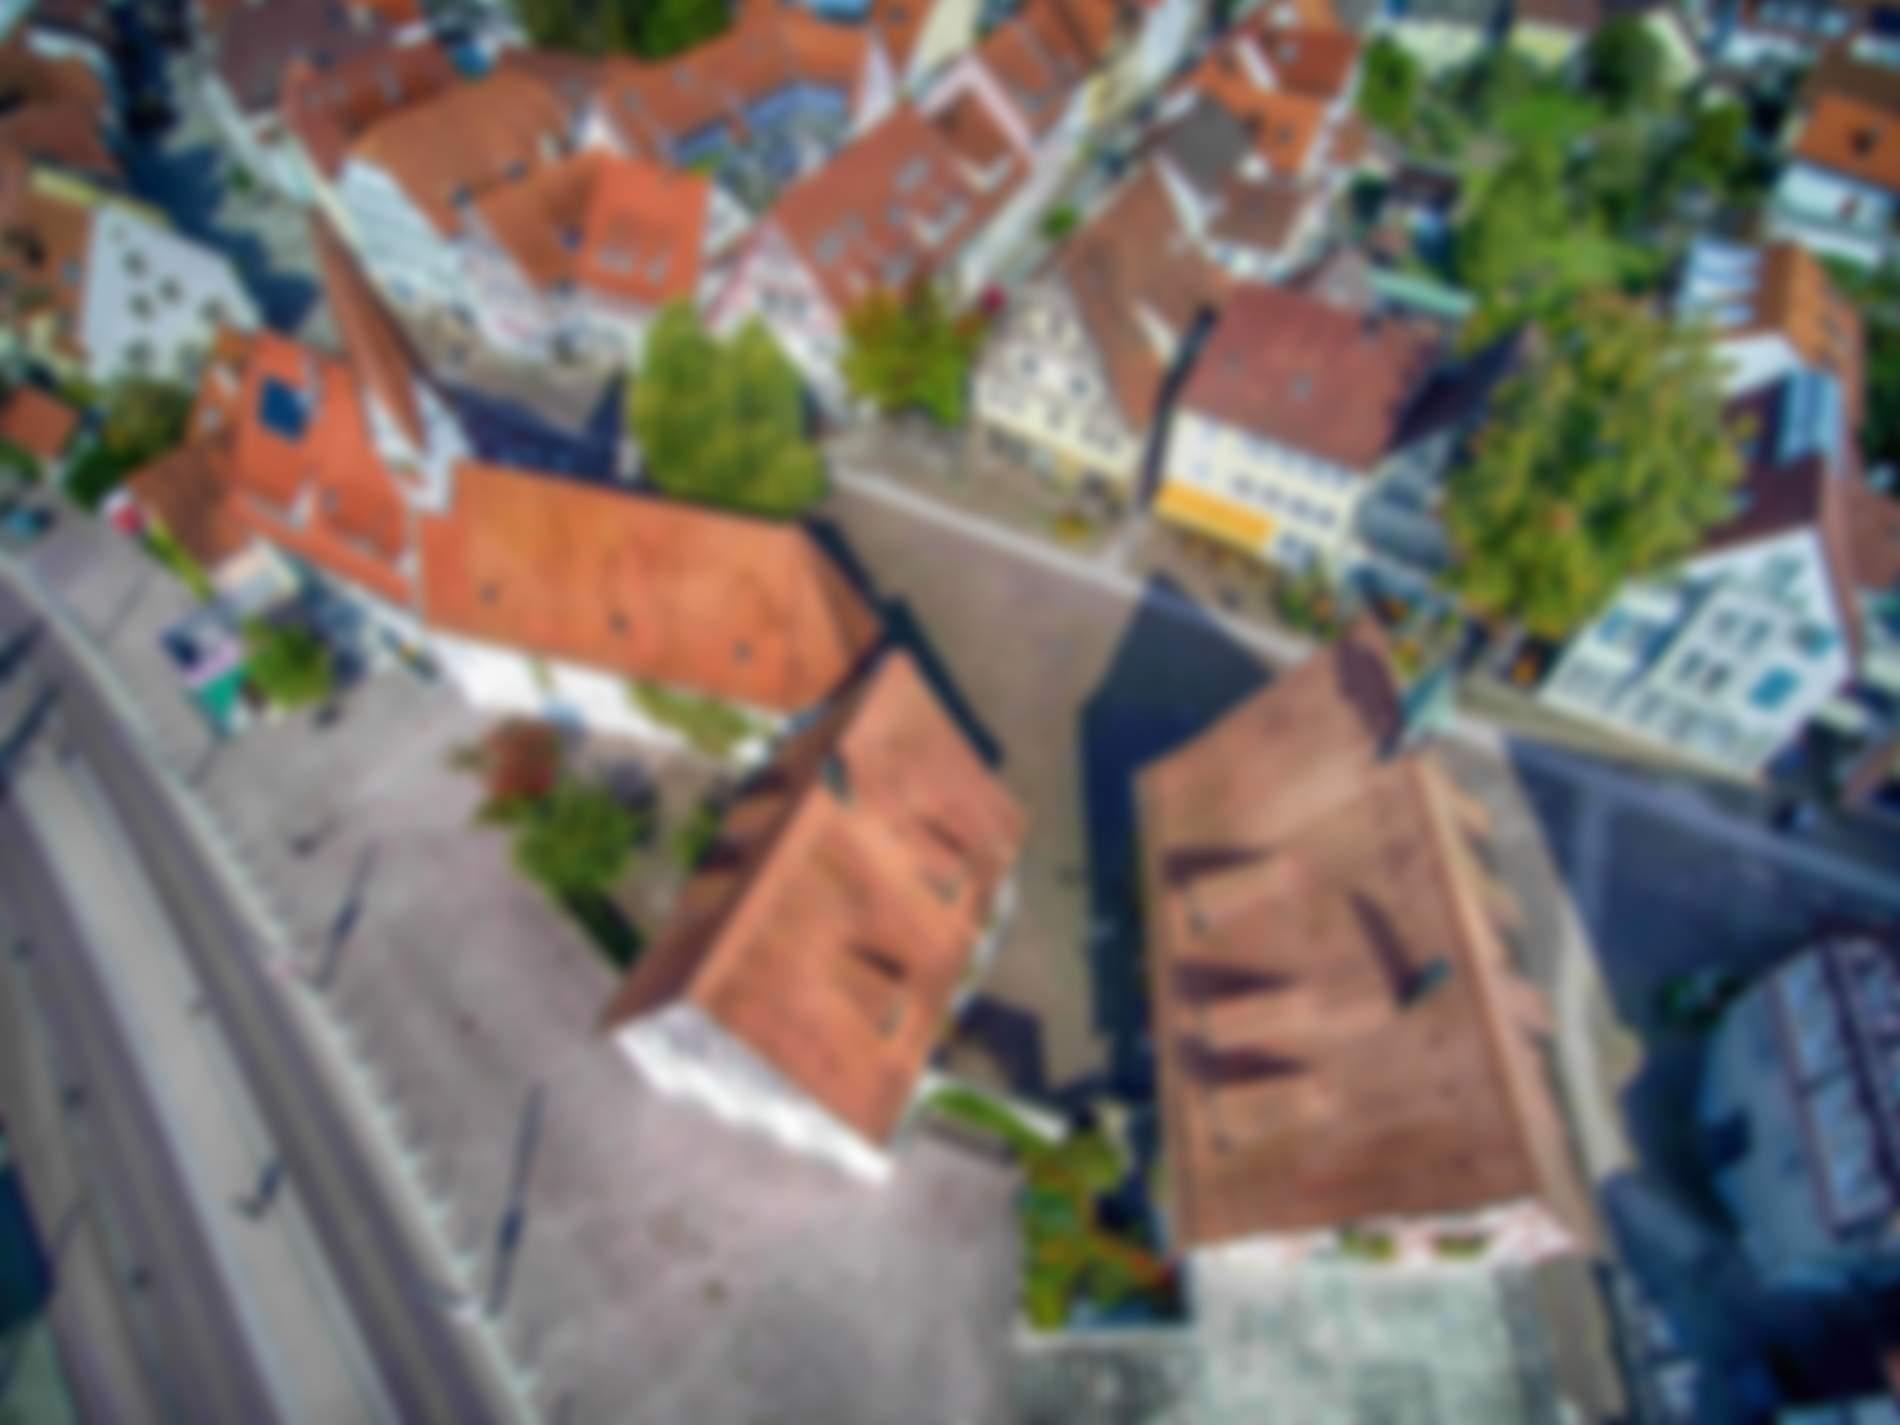 Lidl Vertriebs-GmbH & Co. KG